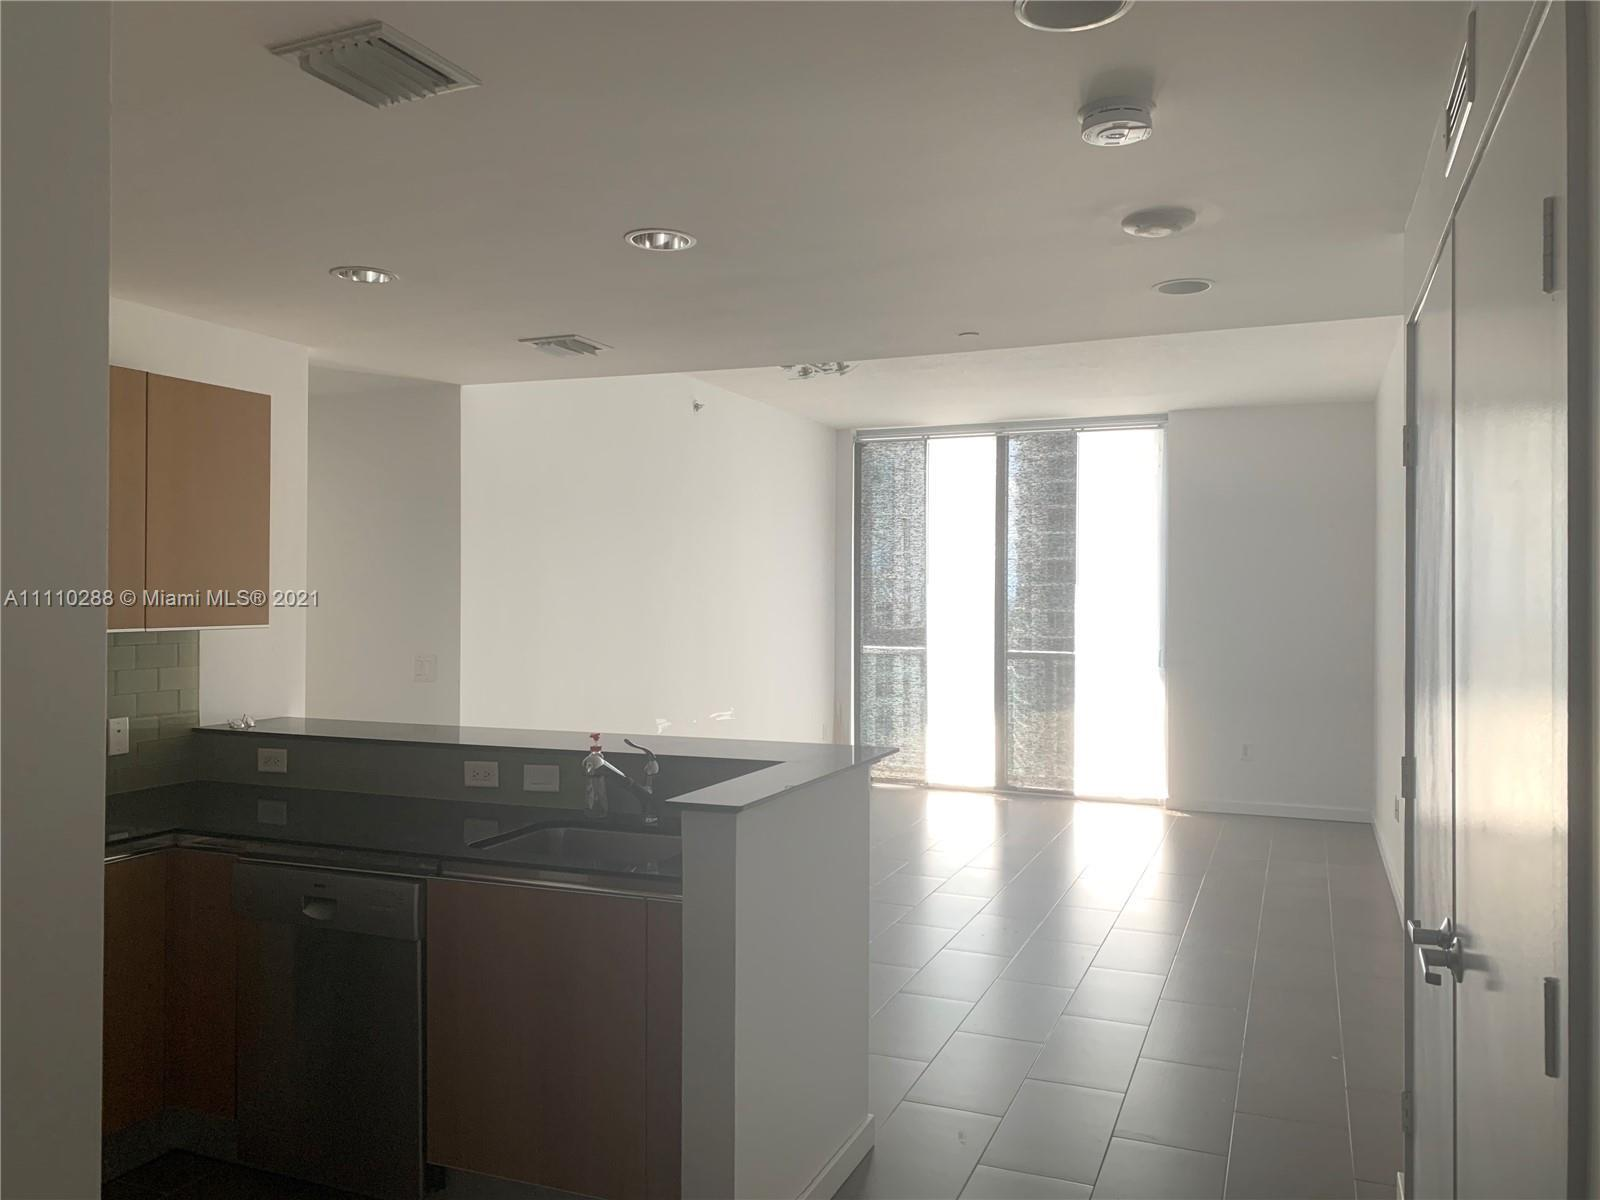 Beautiful 2 bed 2 bath corner unit in the exclusive 1060 Brickell Condo offering floor-to-ceiling hi